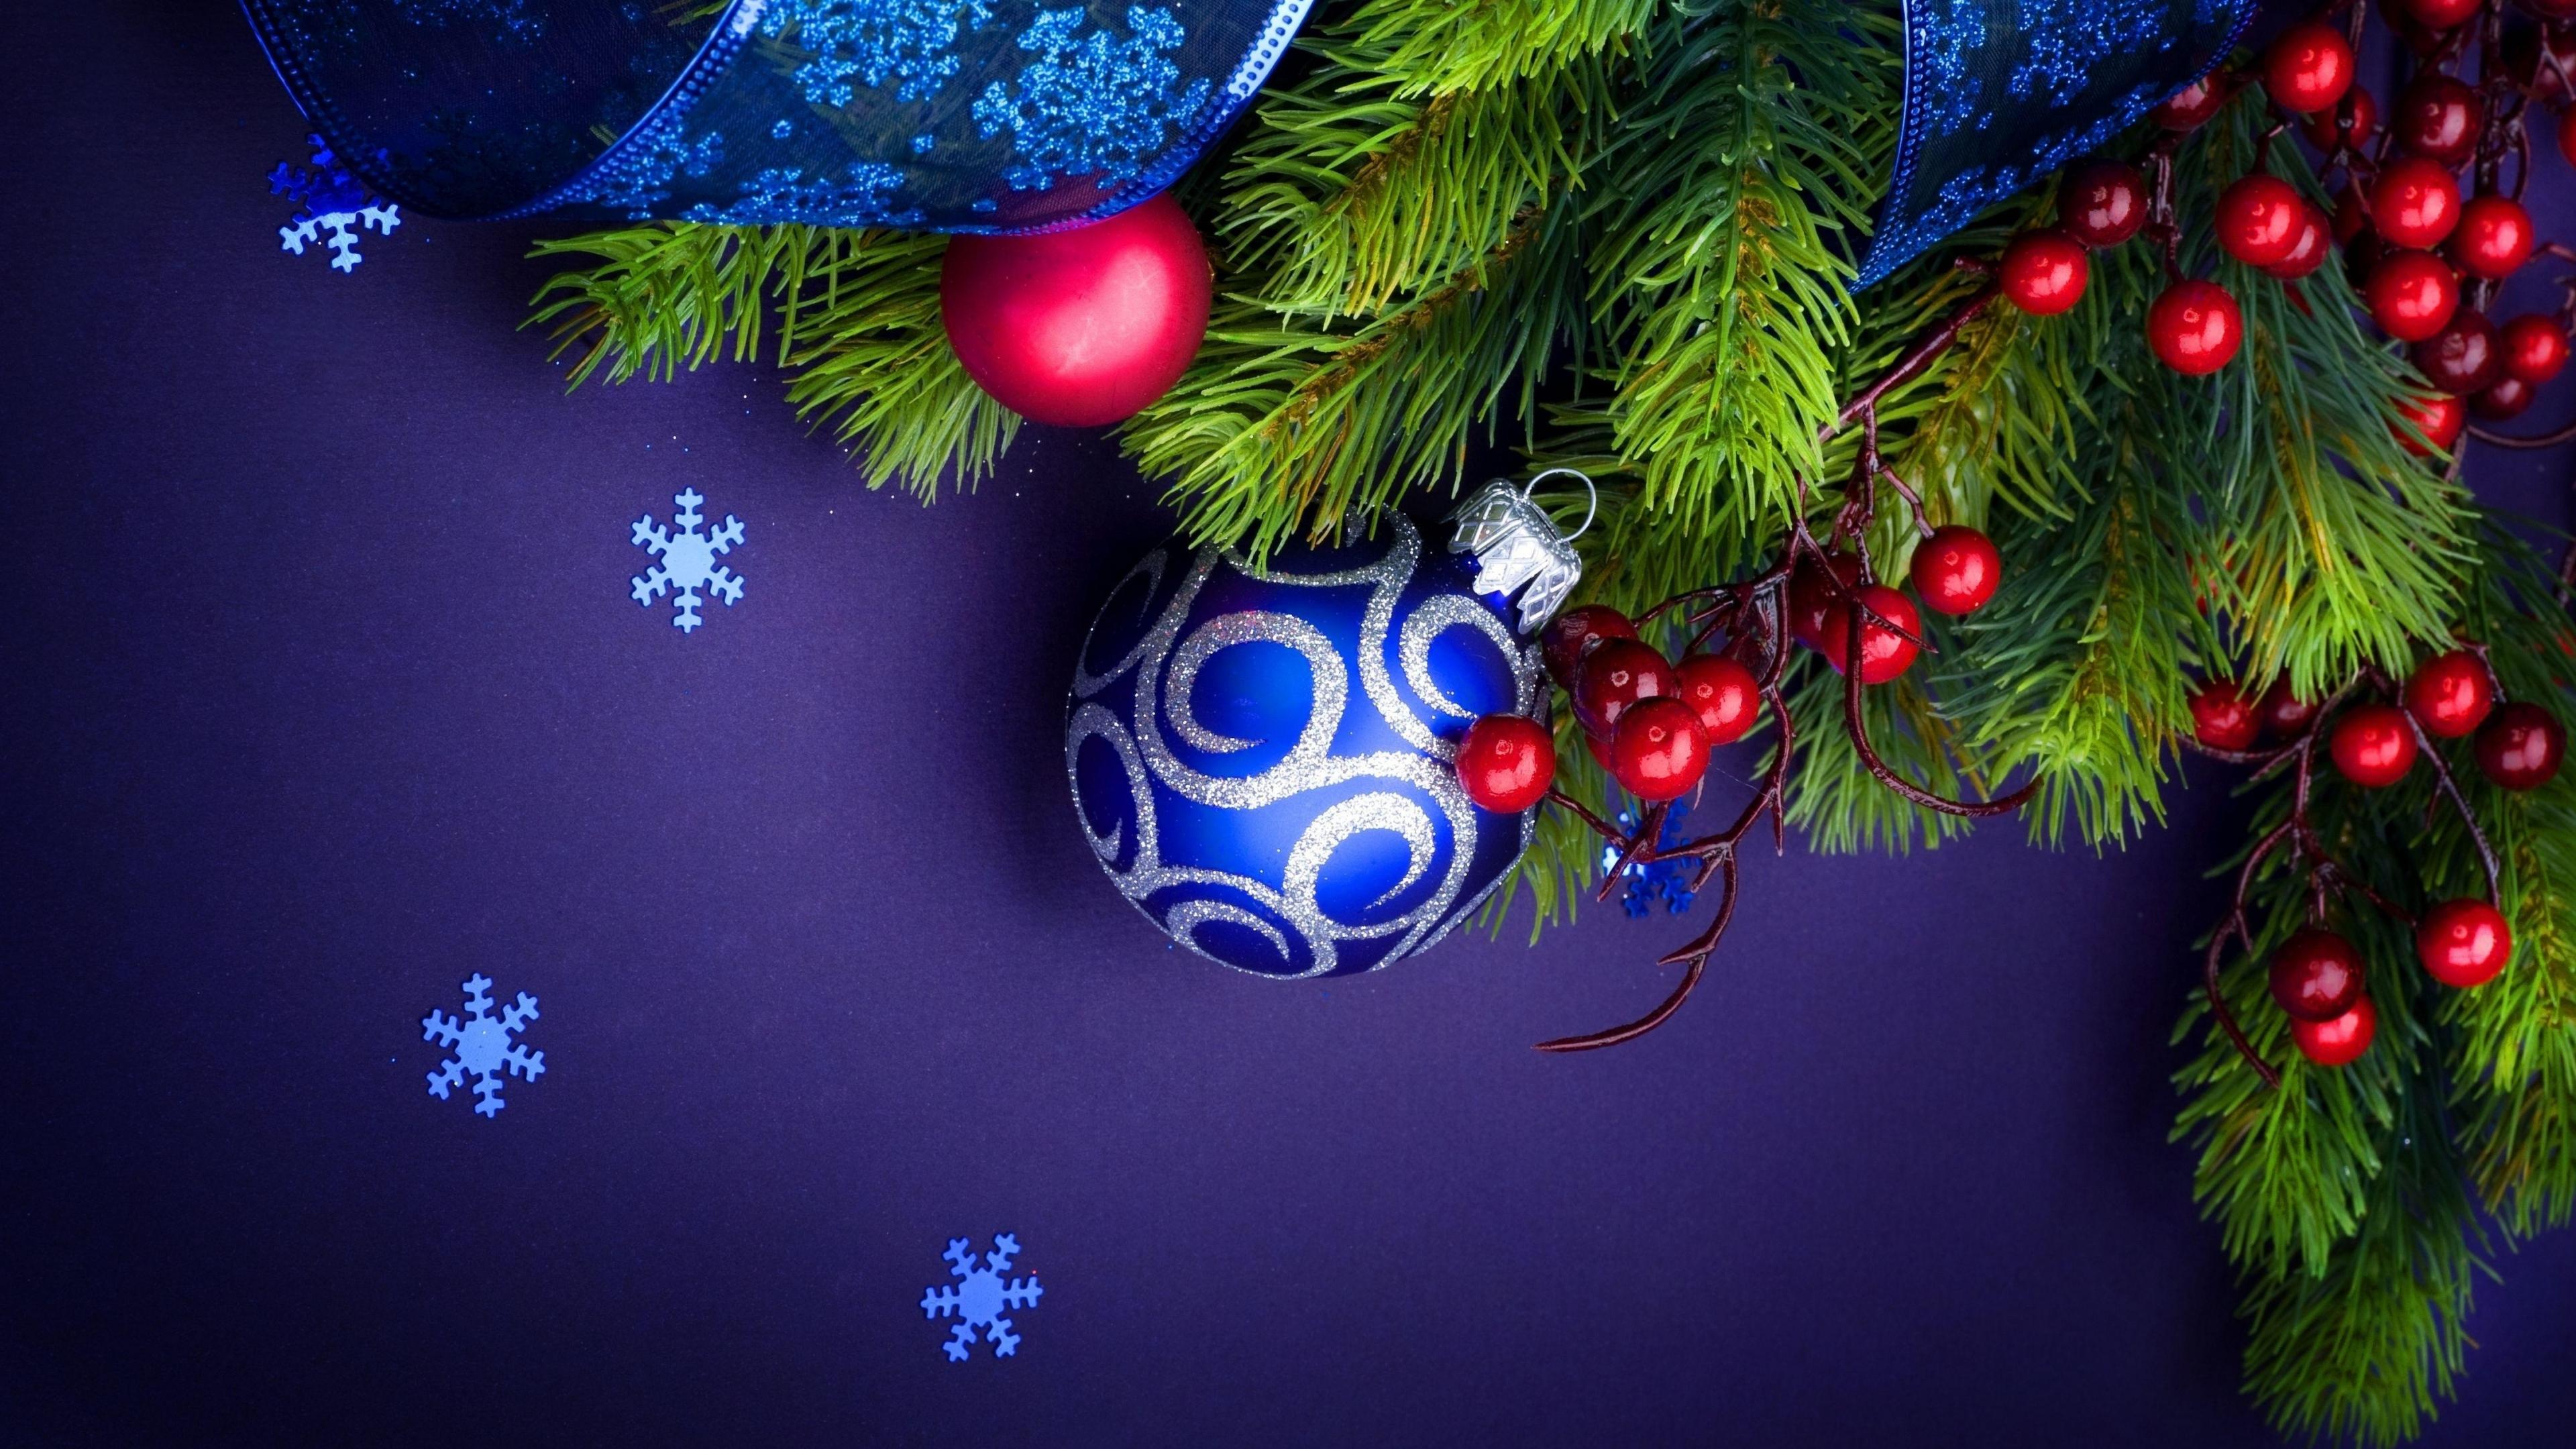 45] 4K Christmas Wallpaper on WallpaperSafari 3840x2160